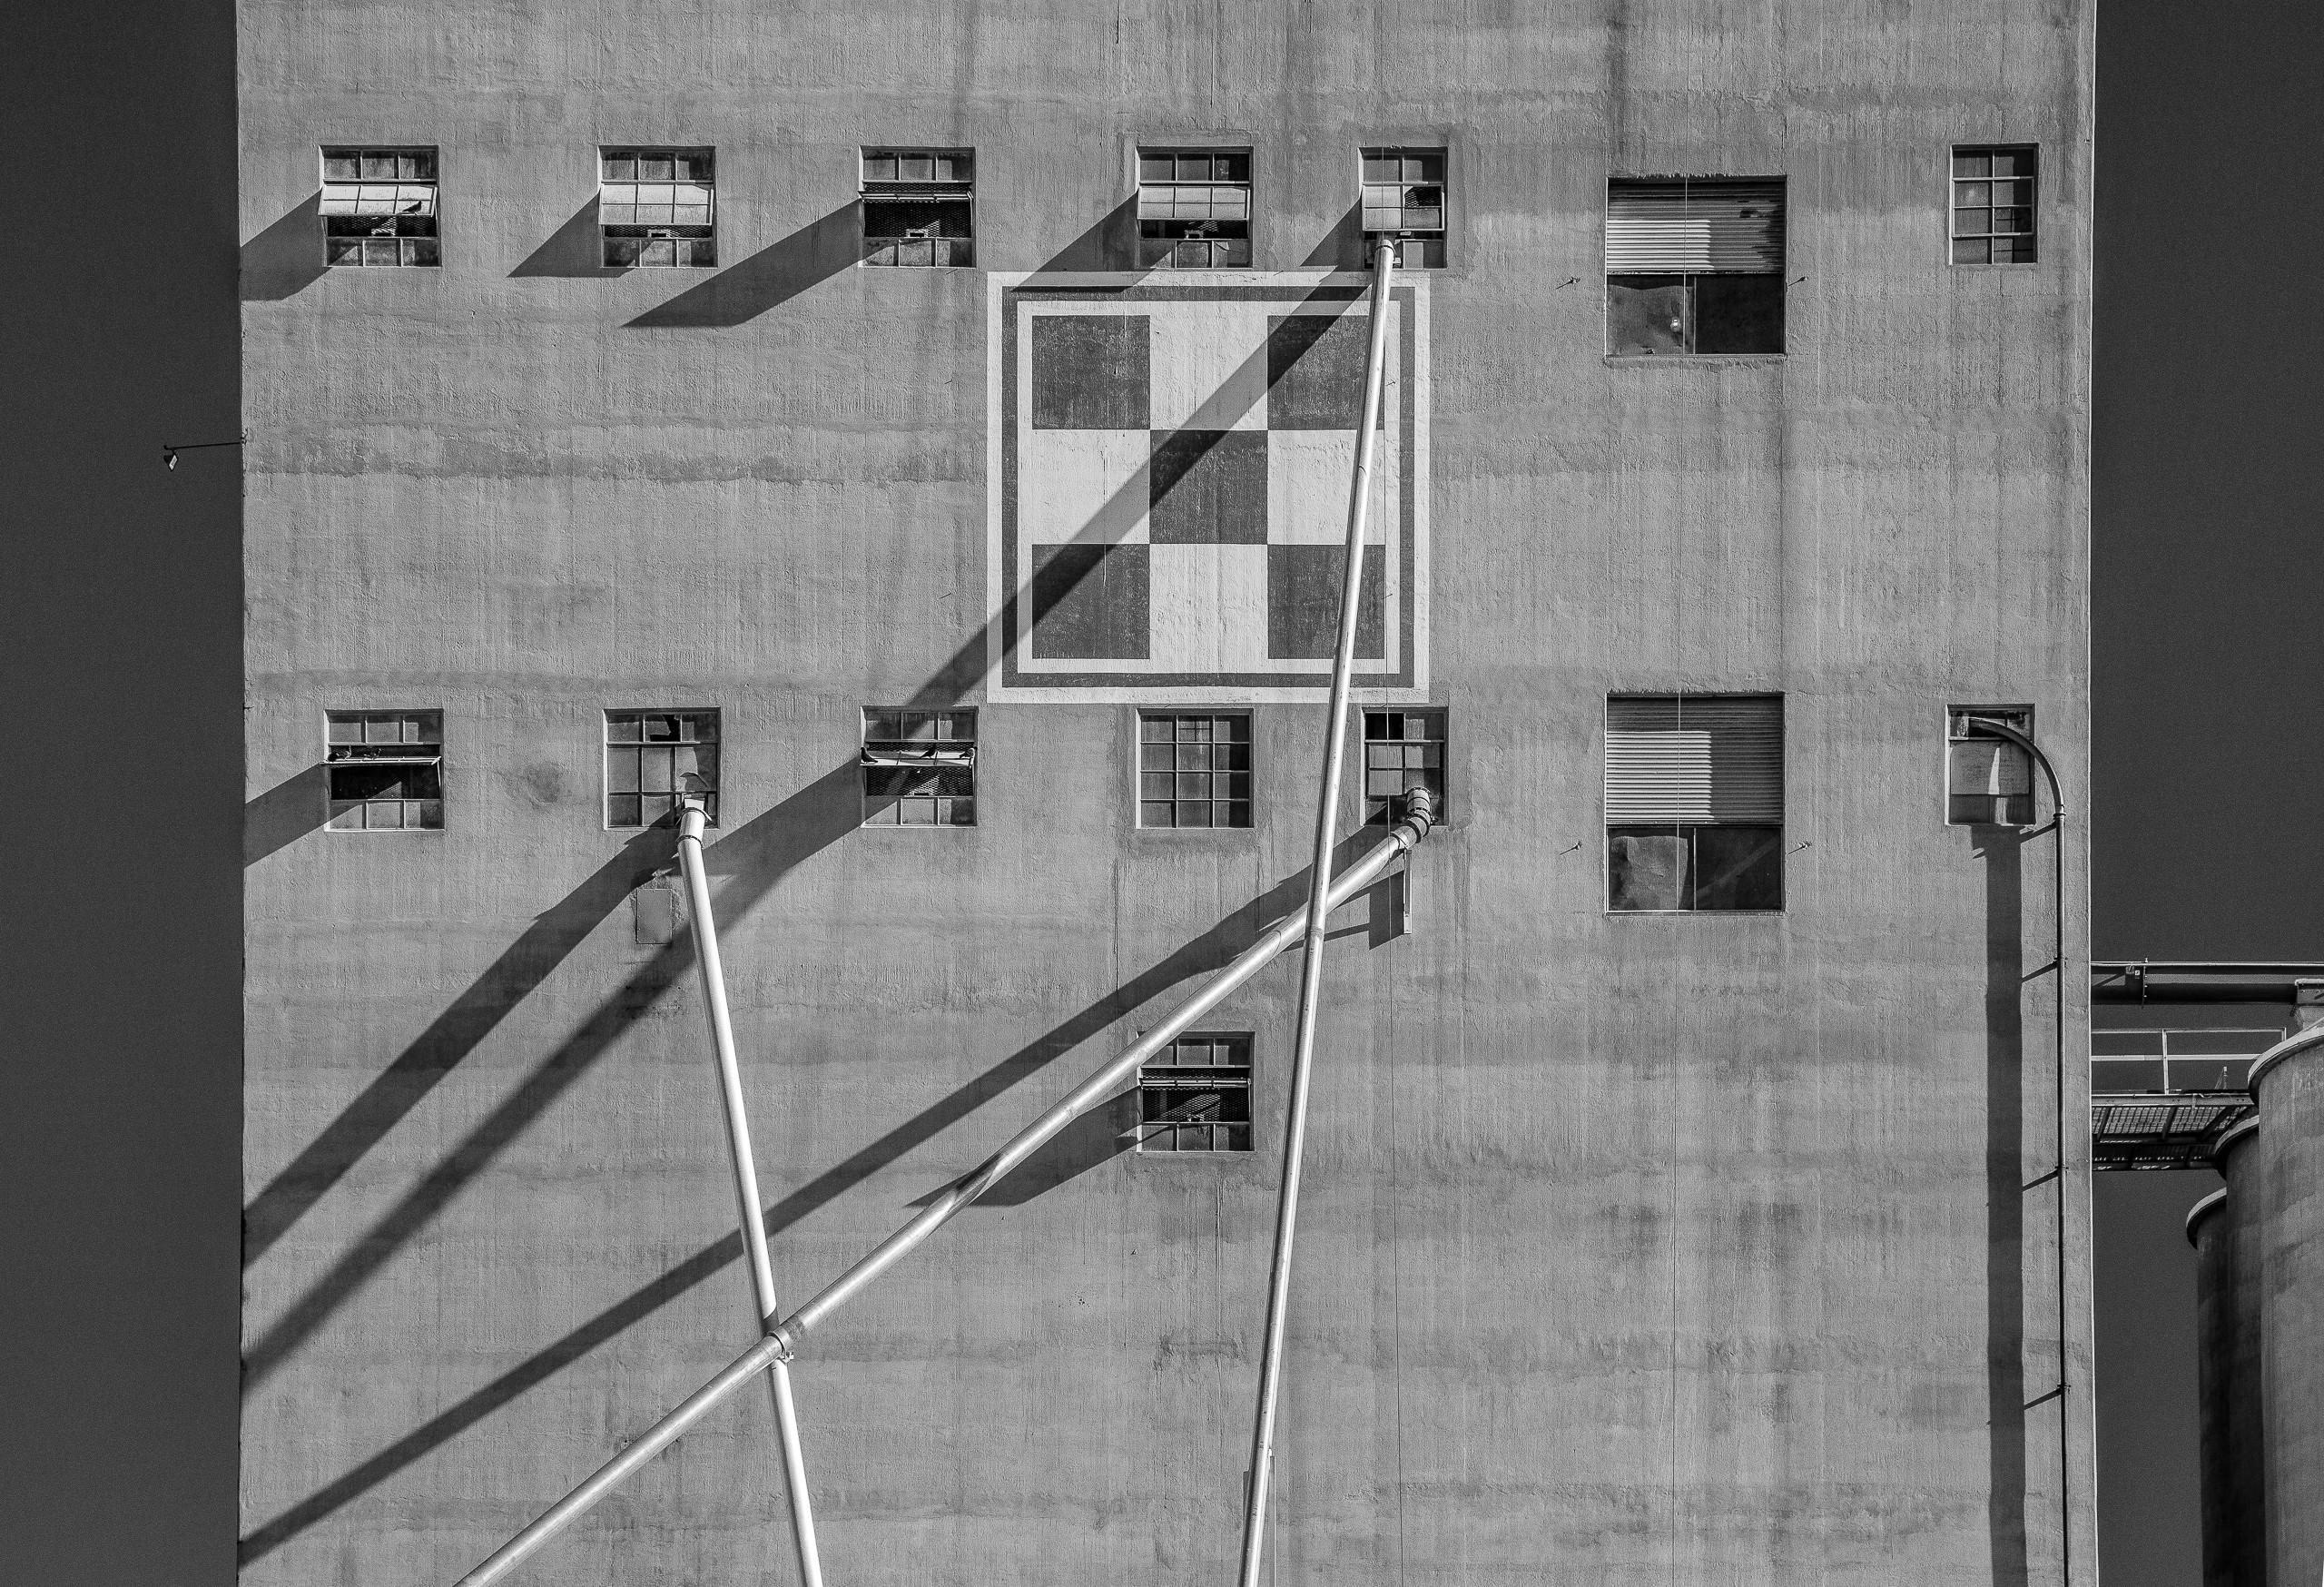 Ralston Grid